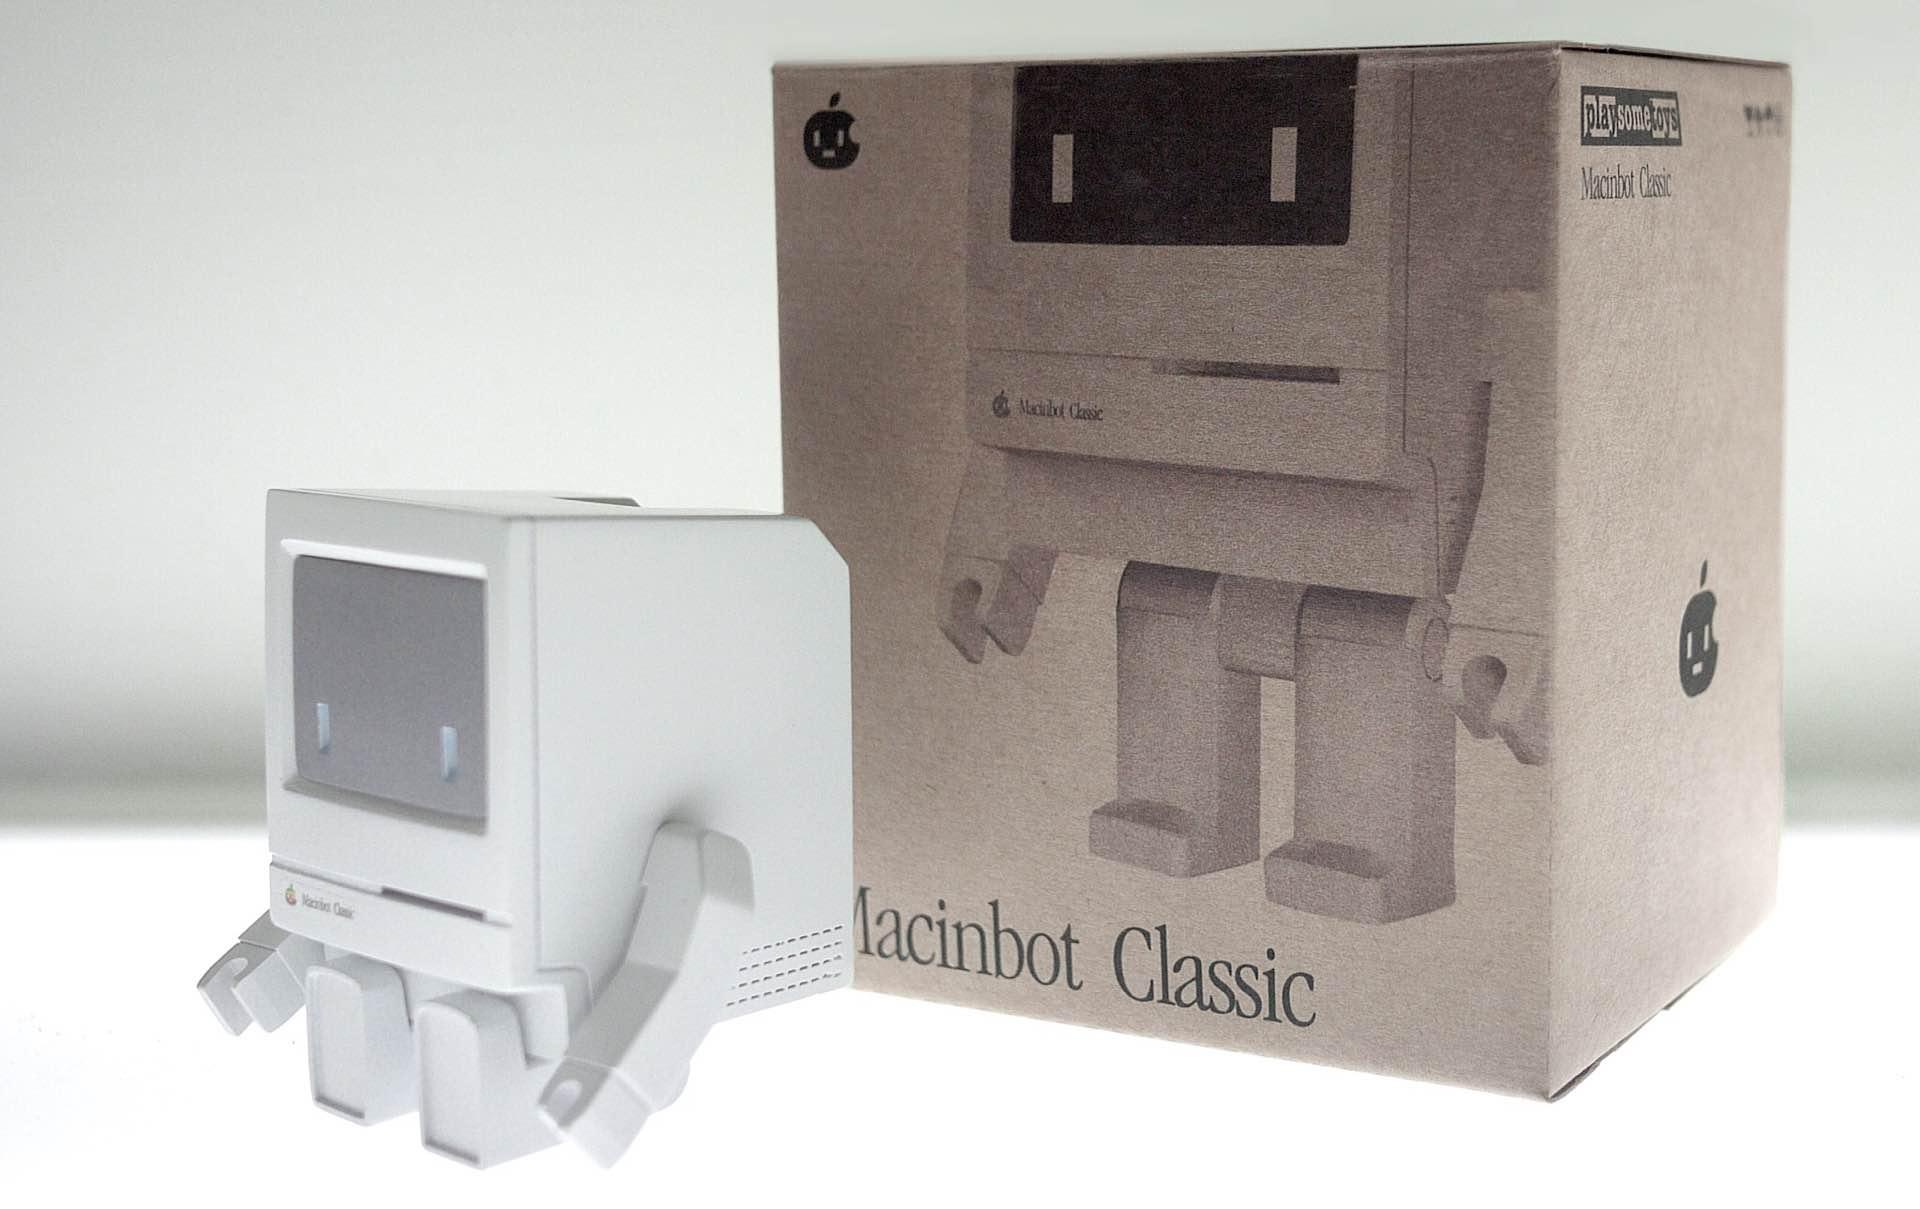 macinbot-classic-pre-order